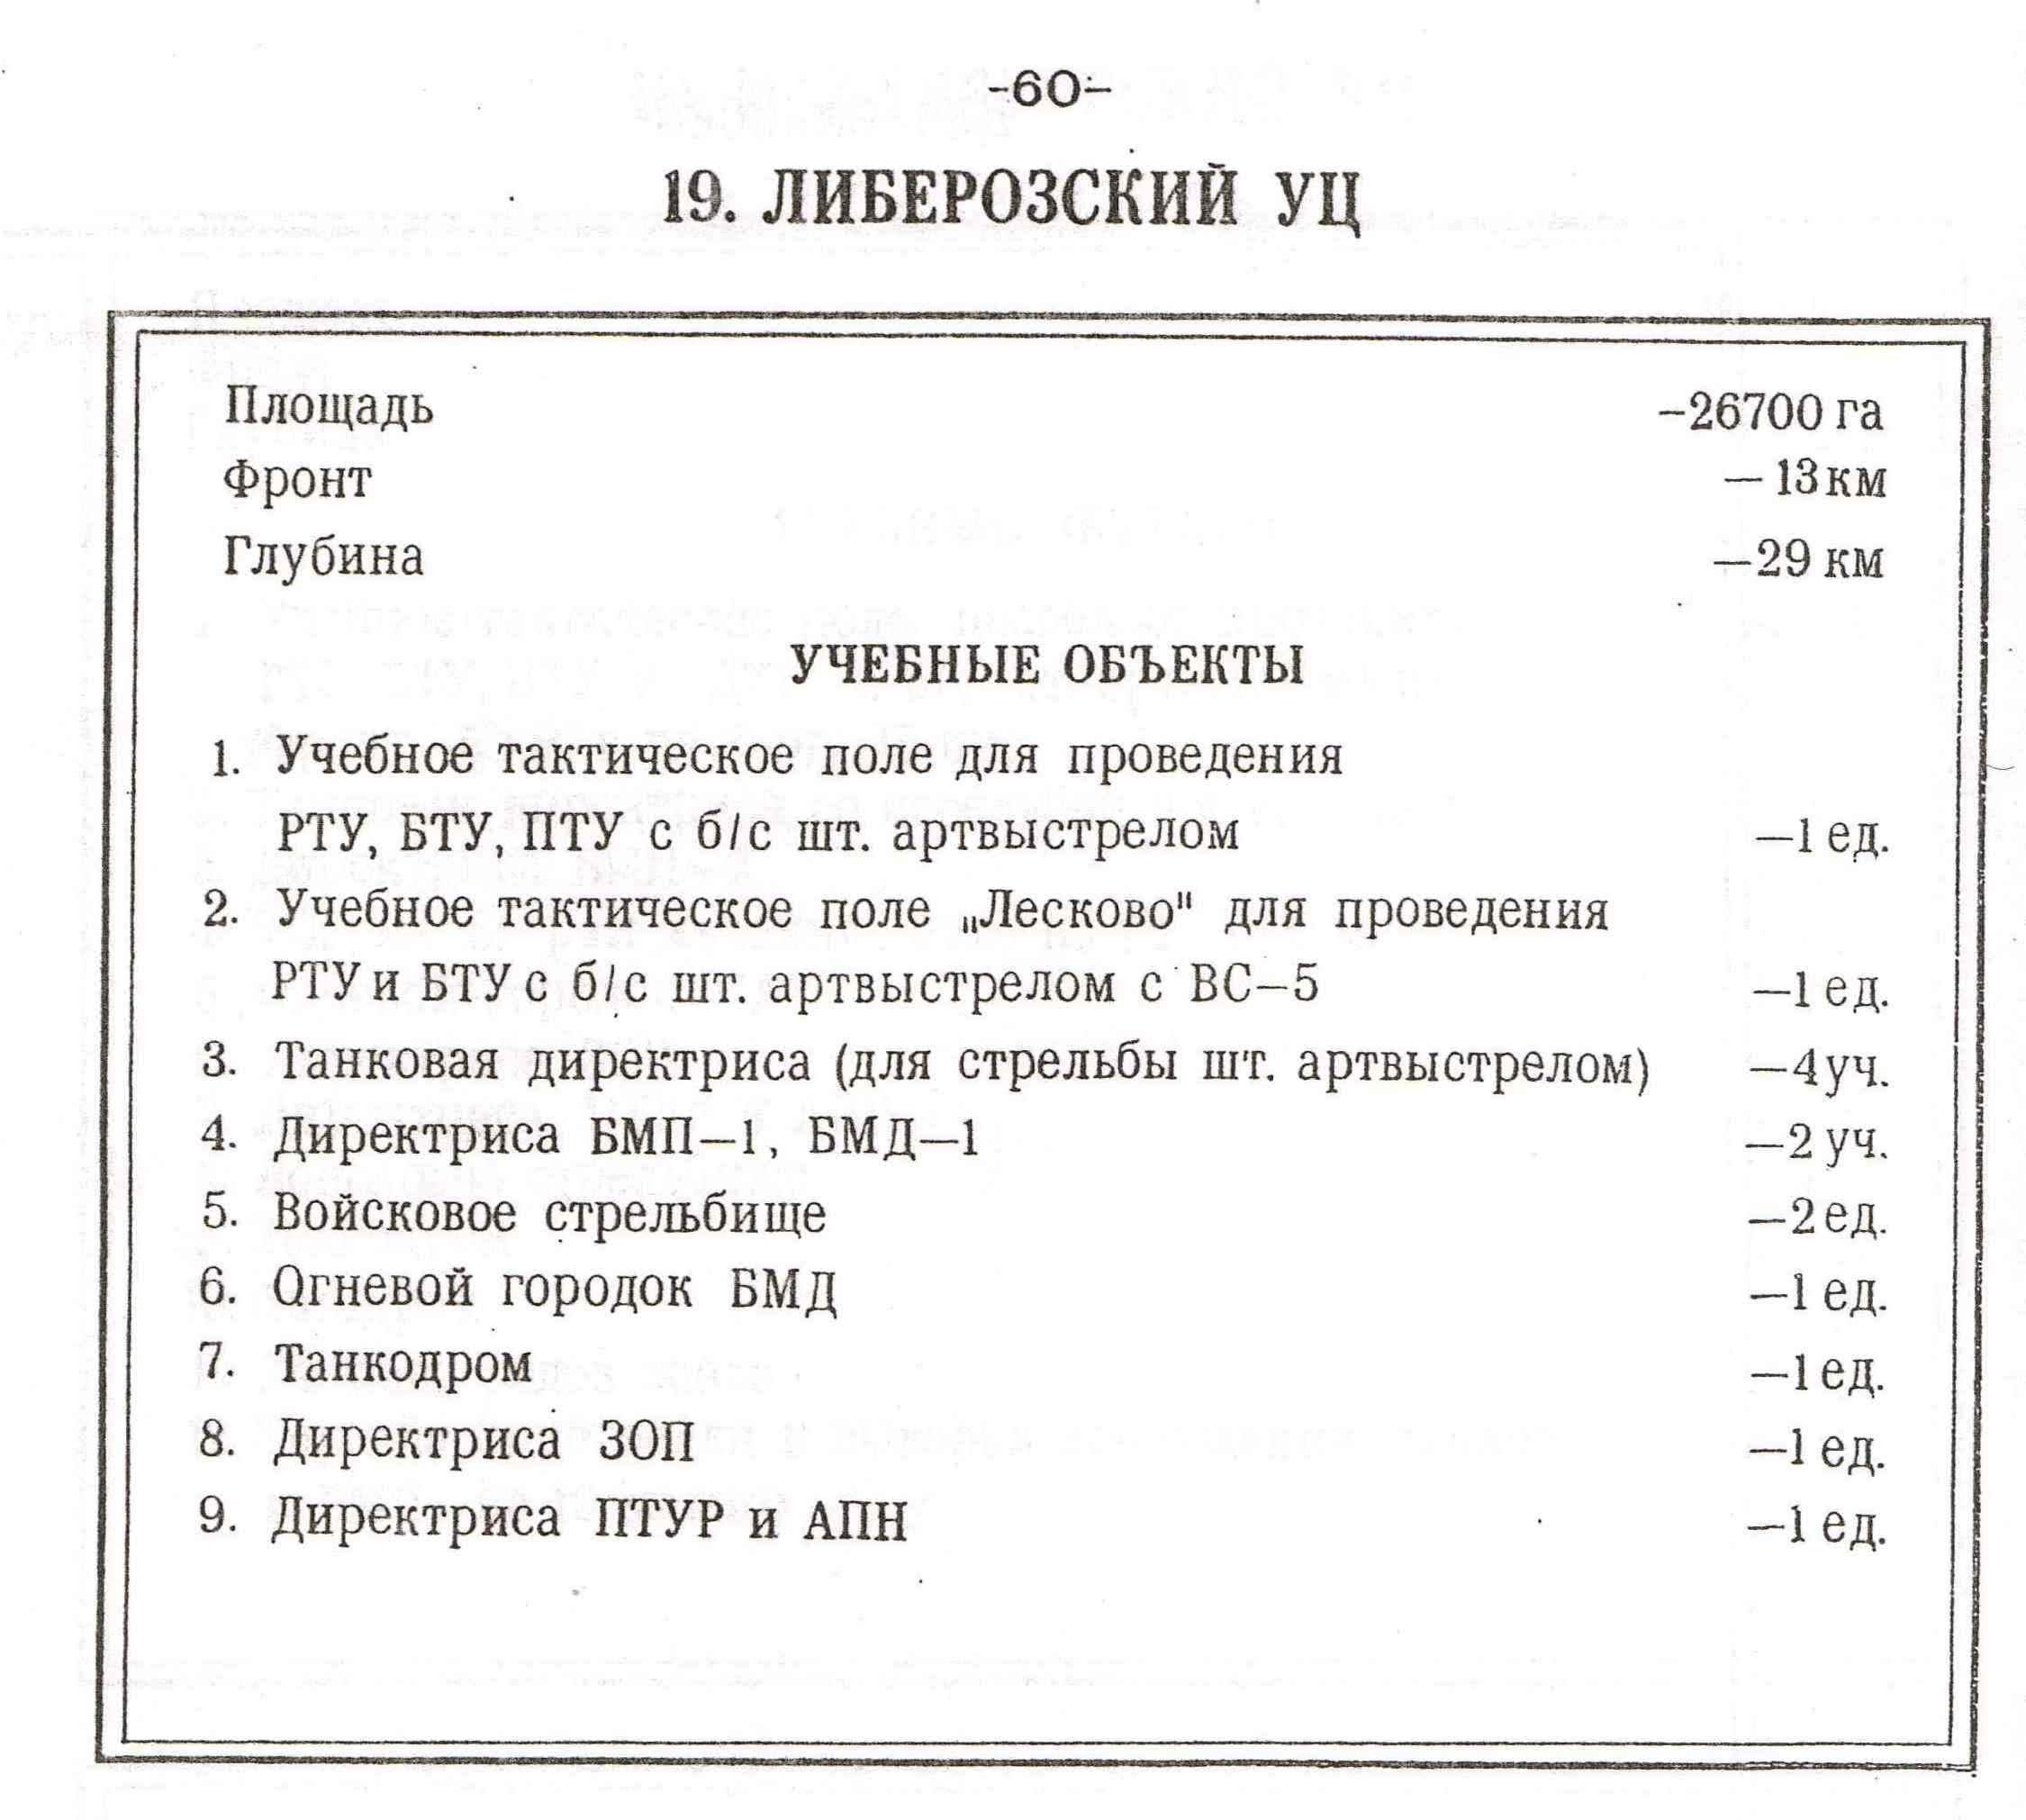 http://s3.uploads.ru/PZHxD.jpg